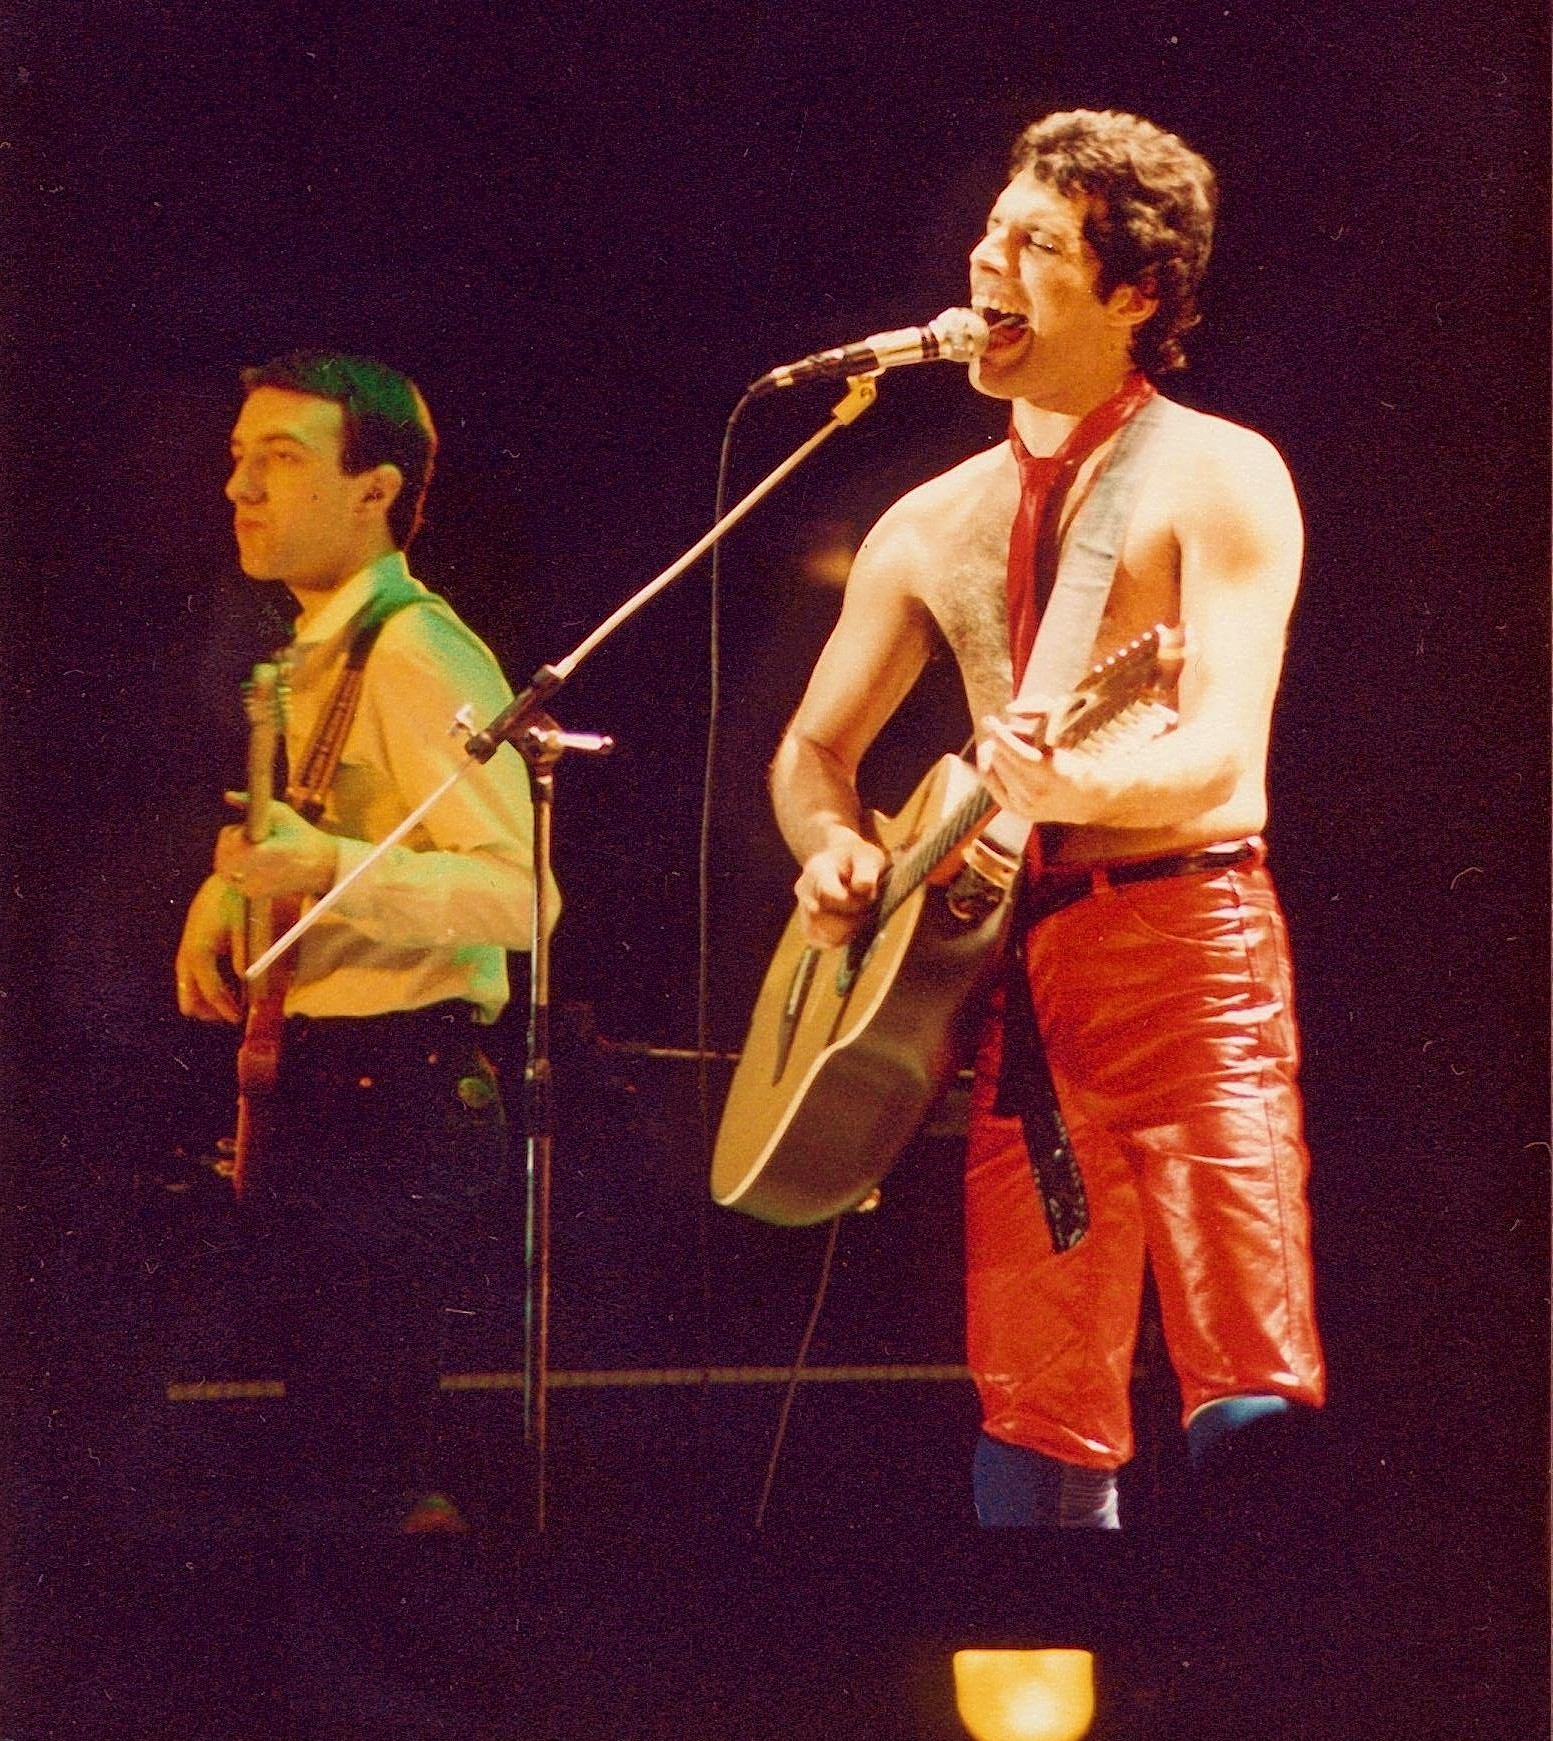 Джон Дикон и Фредди Меркьюри, концерт в Брайтоне, 10 декабря 1979 года